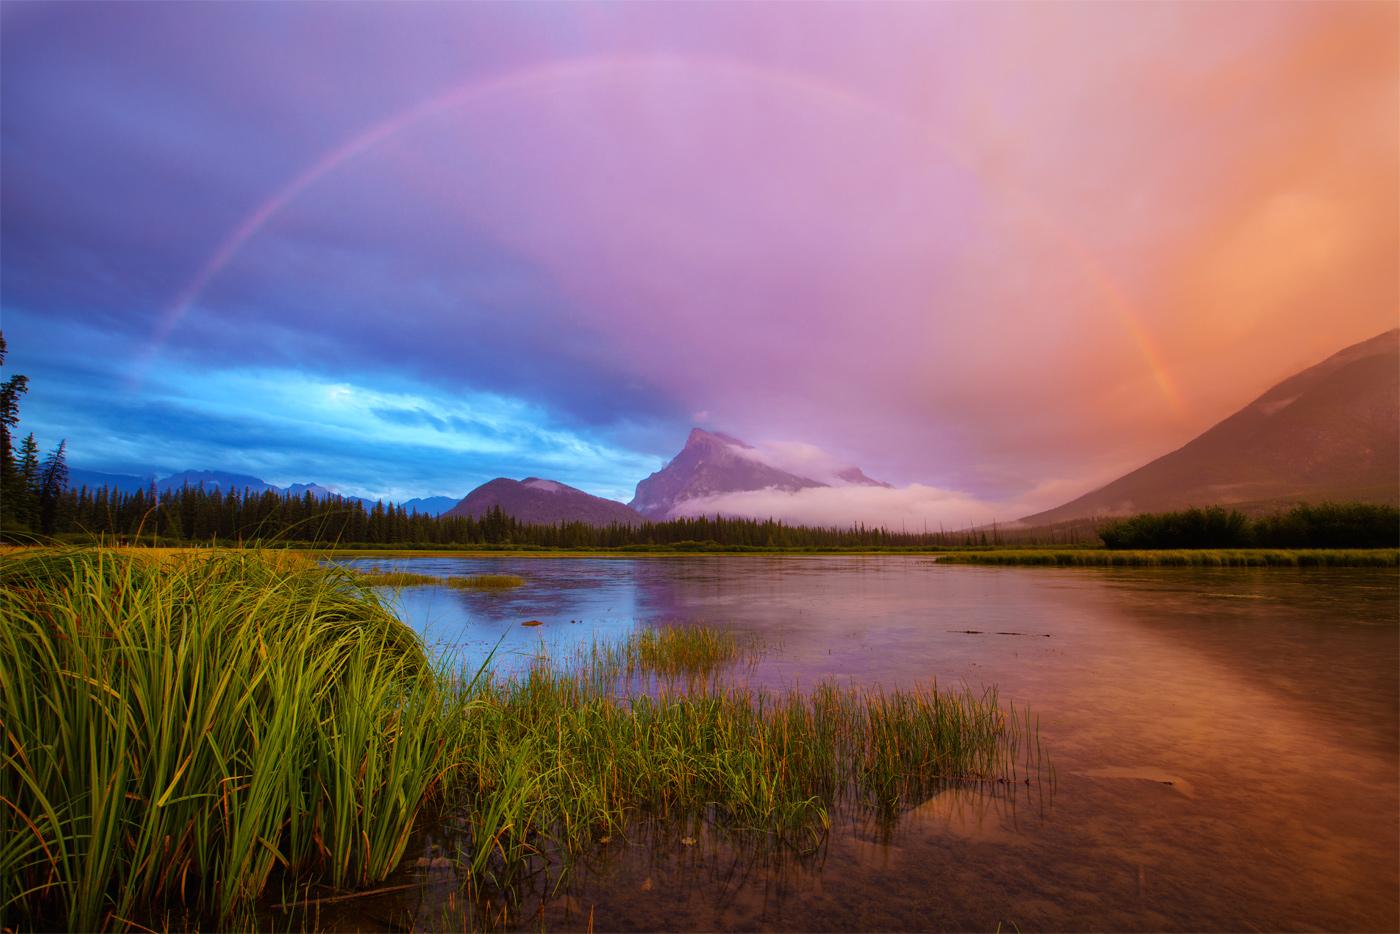 Rainbow over Mt. Rundle